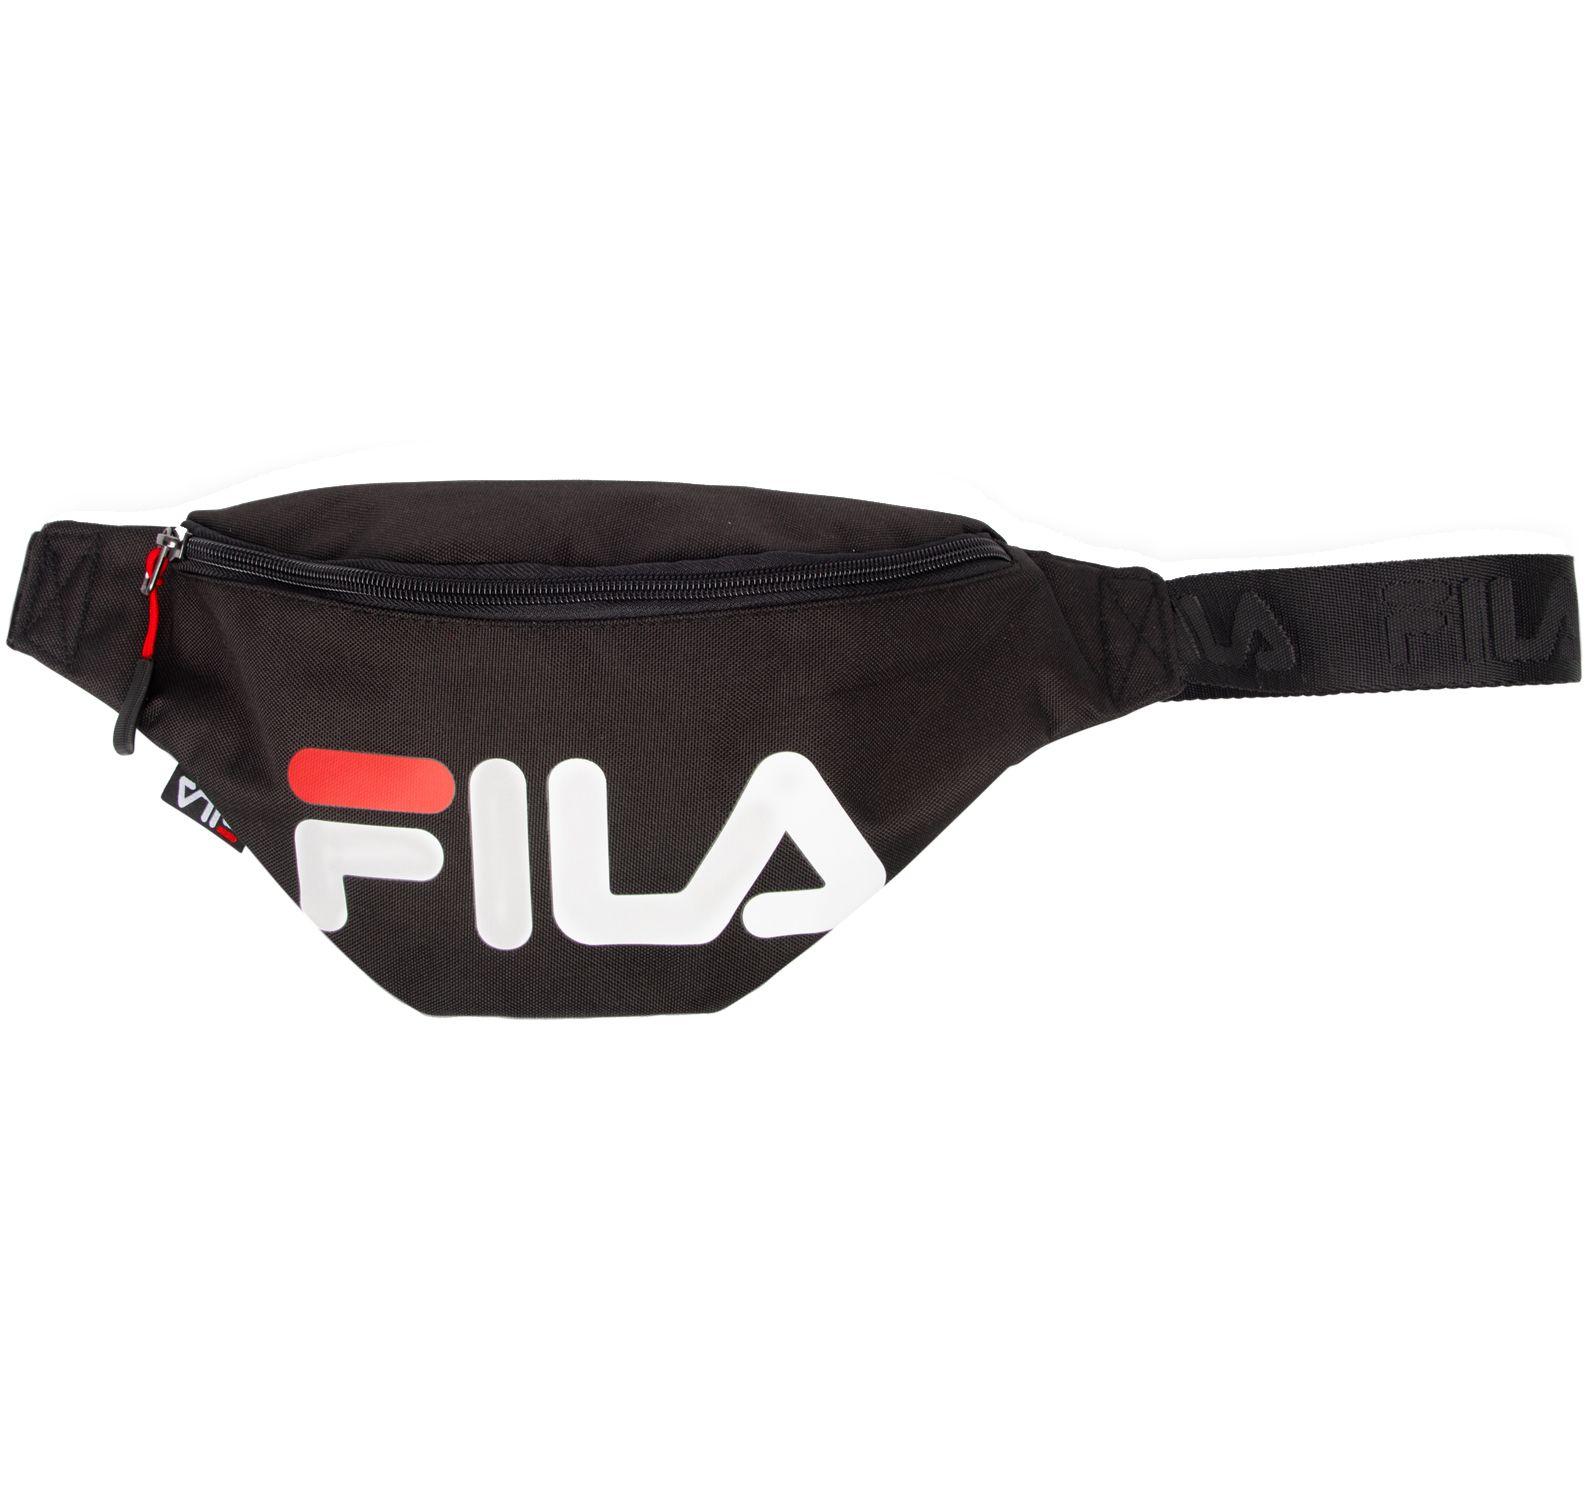 waist bag slim, black, one size, fila – fila